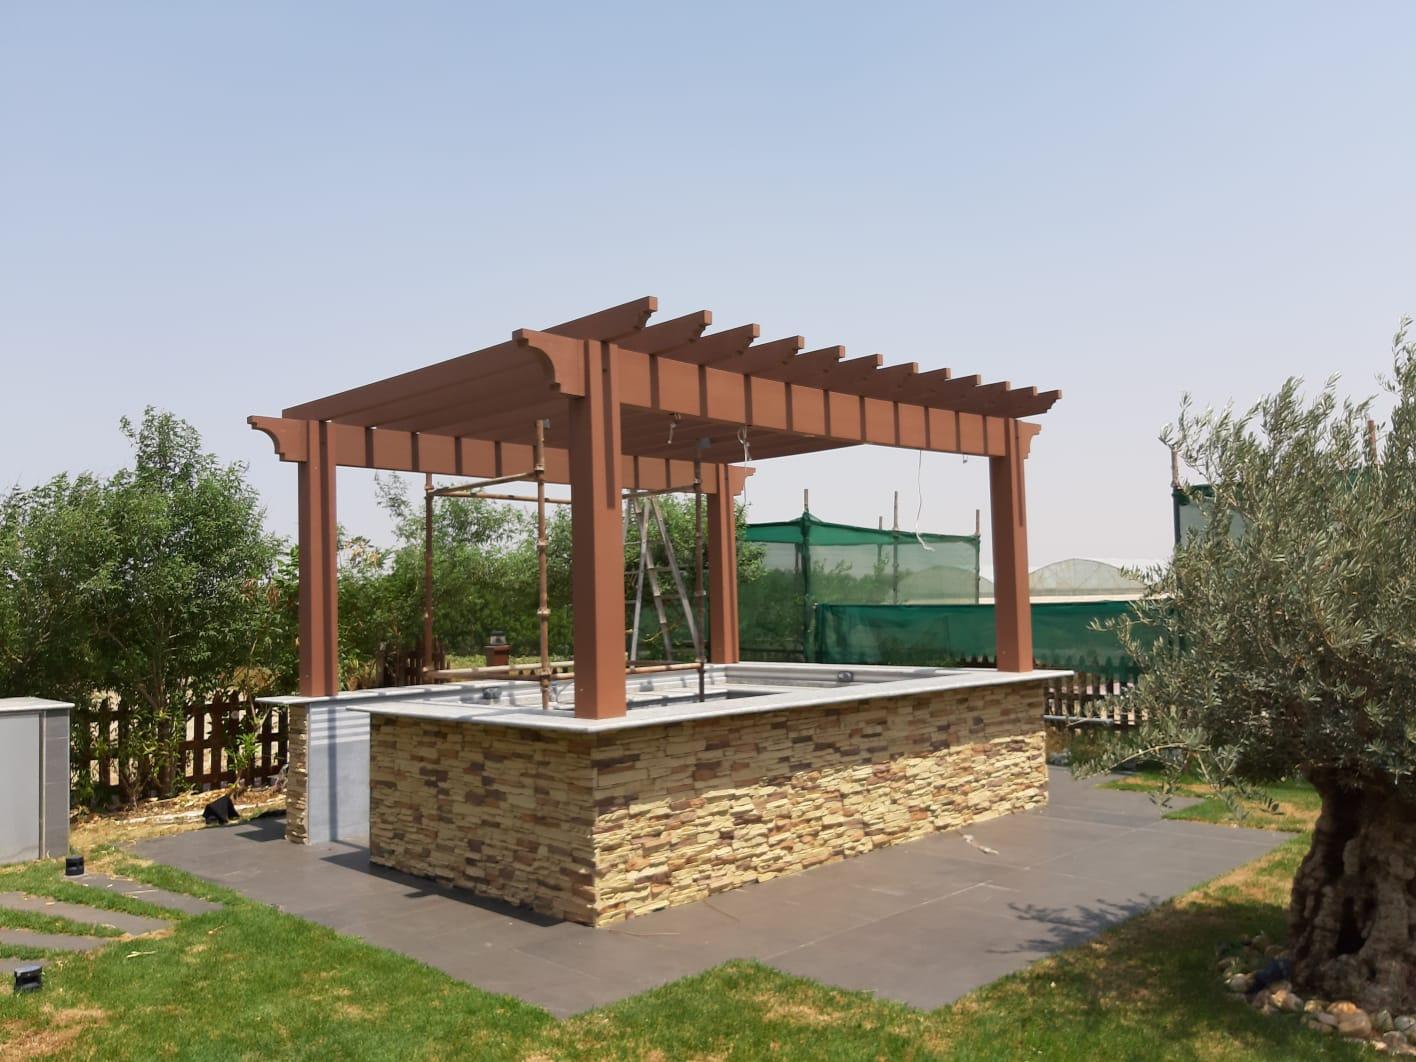 Dura Pergola With Decoration Garden Furniture